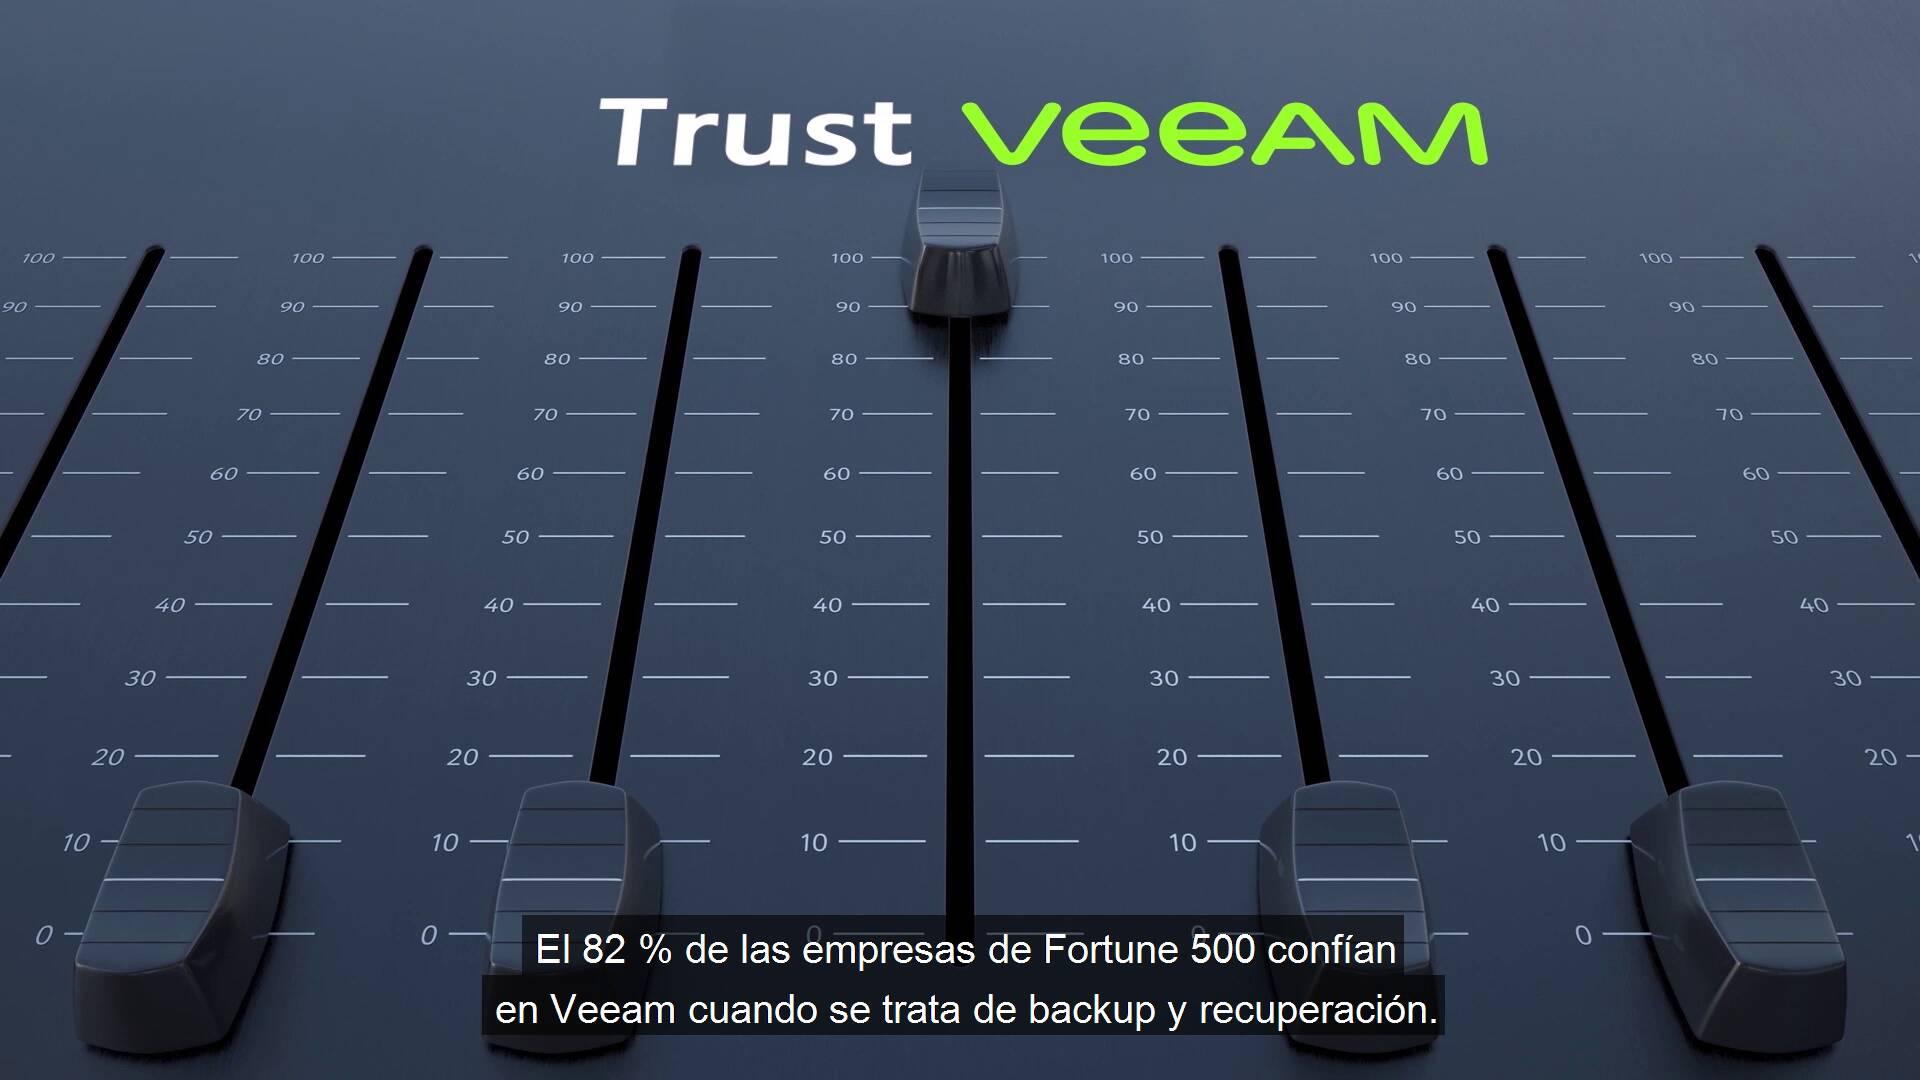 ES lat Corporate Messaging Why Veeam - Feb 2020